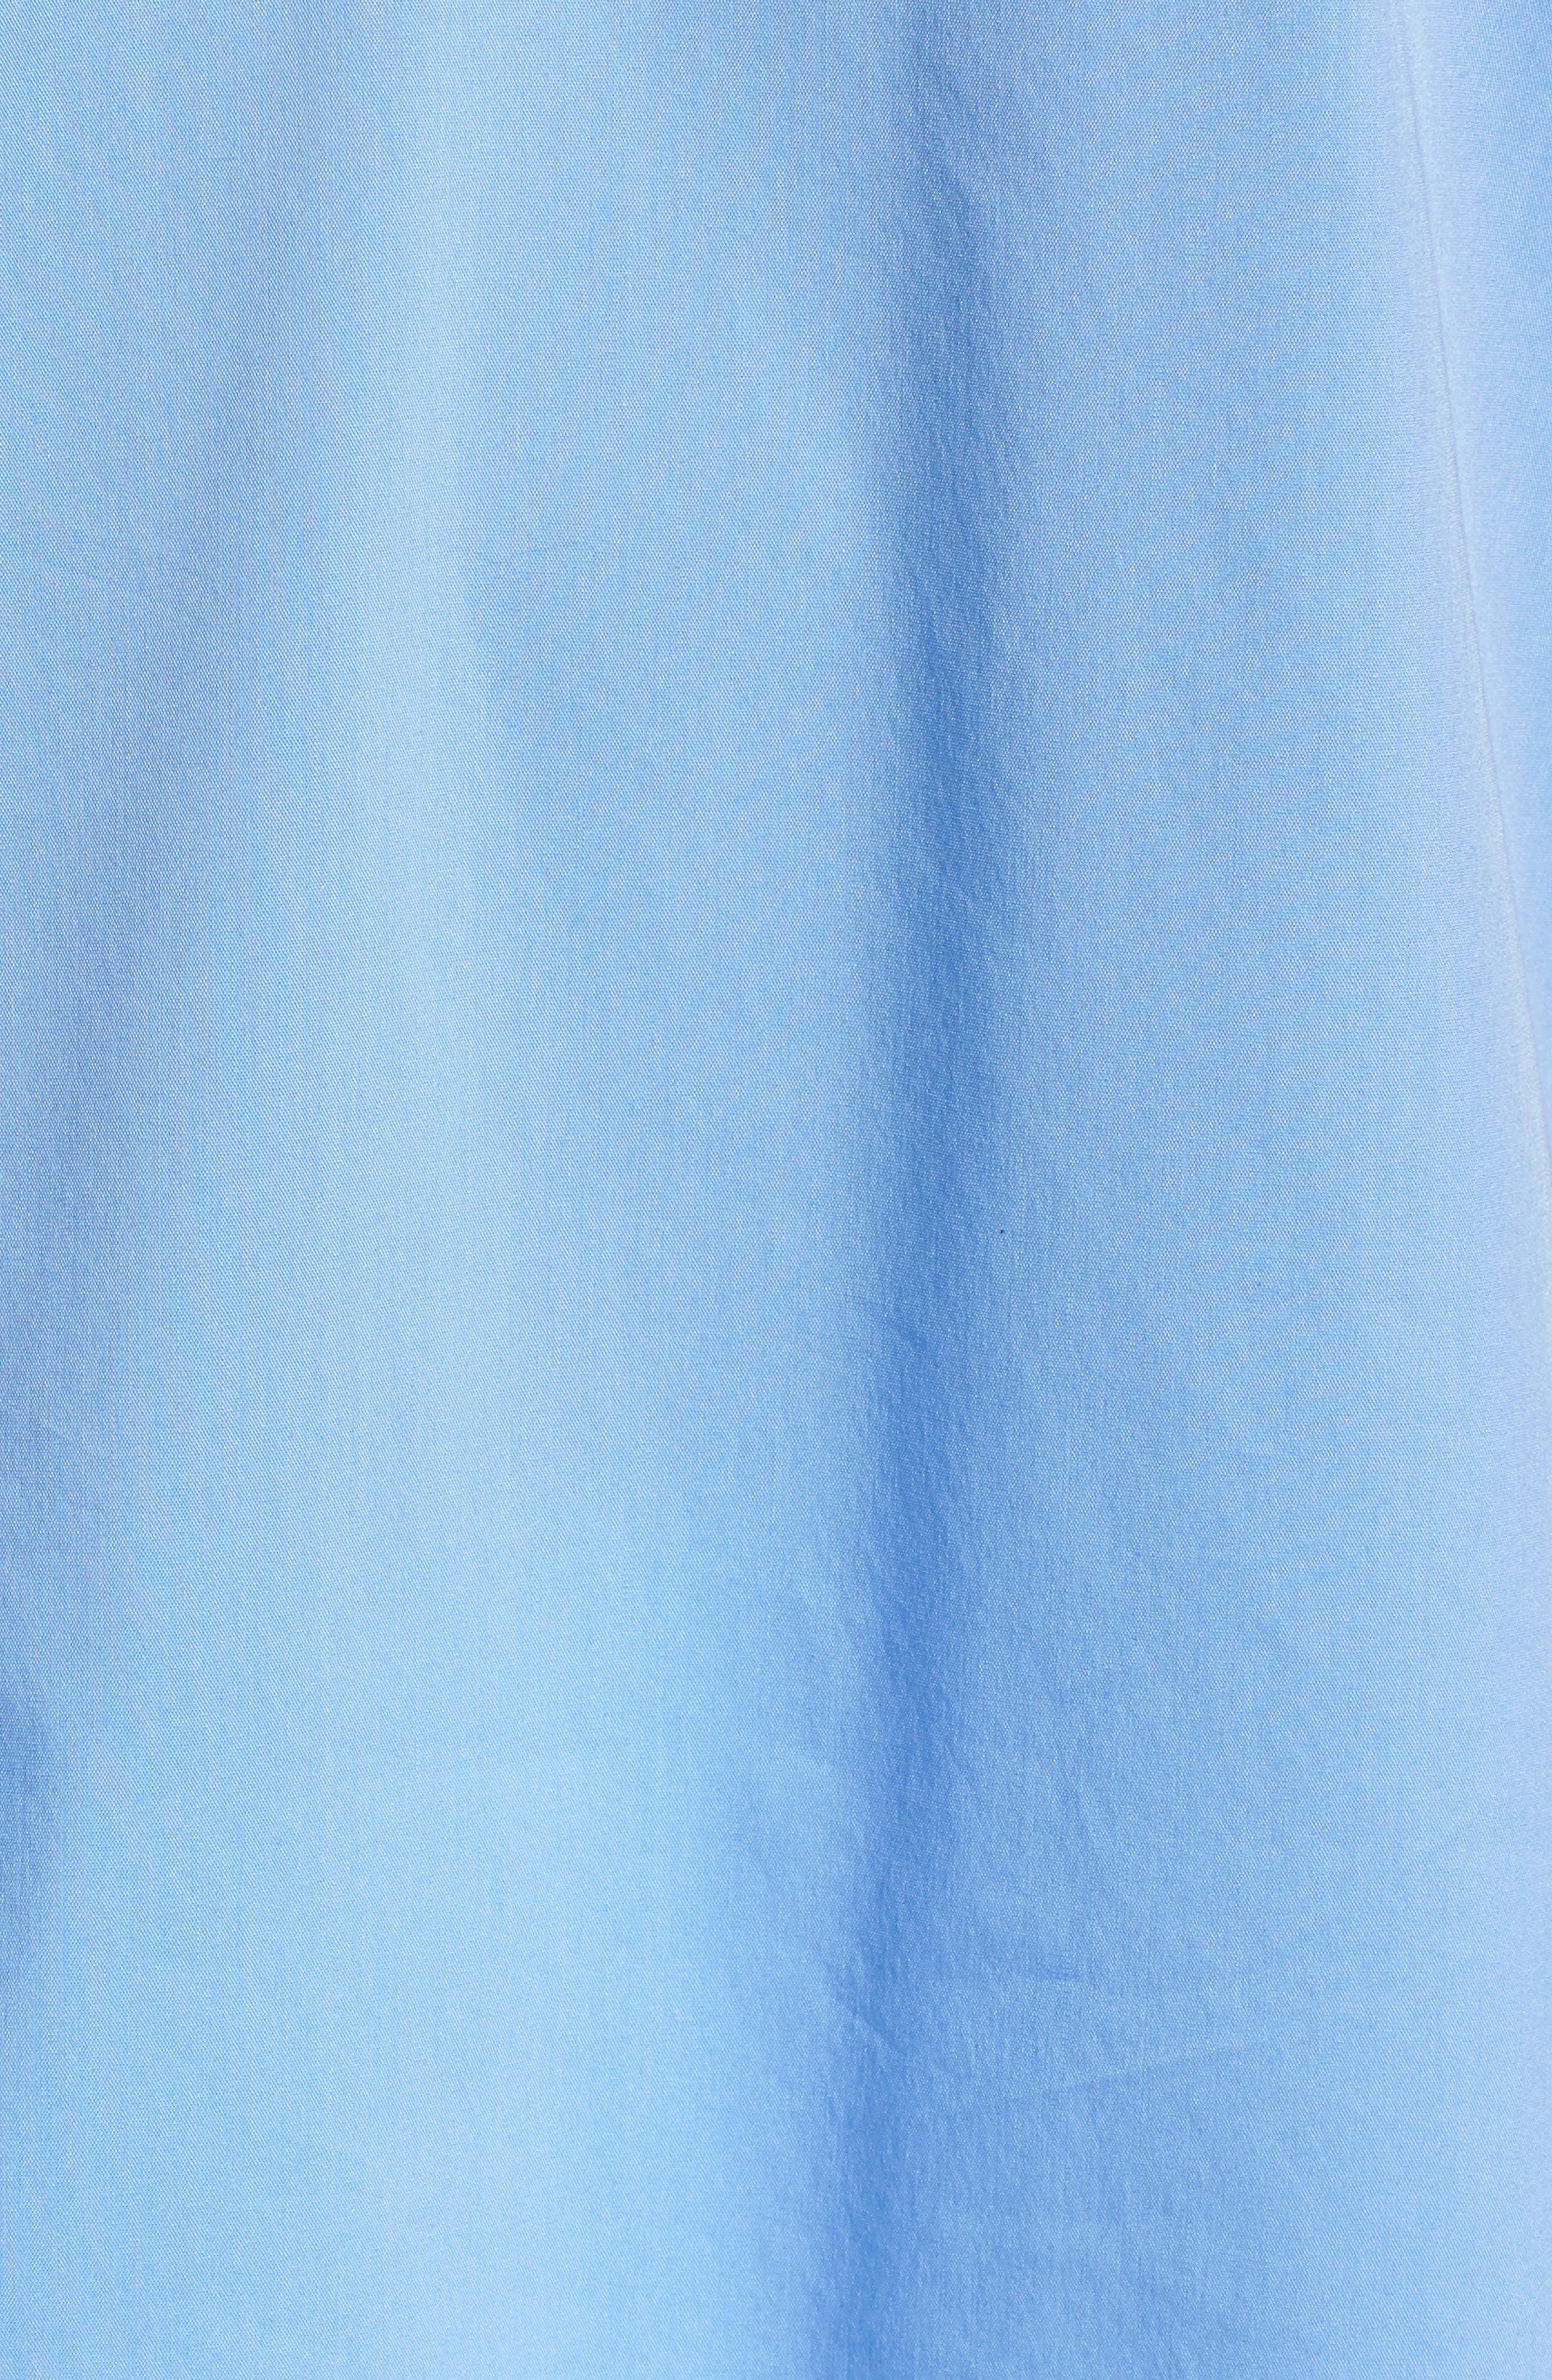 Ruffle Cotton Poplin Blend Top,                             Alternate thumbnail 4, color,                             Blue Cornflower